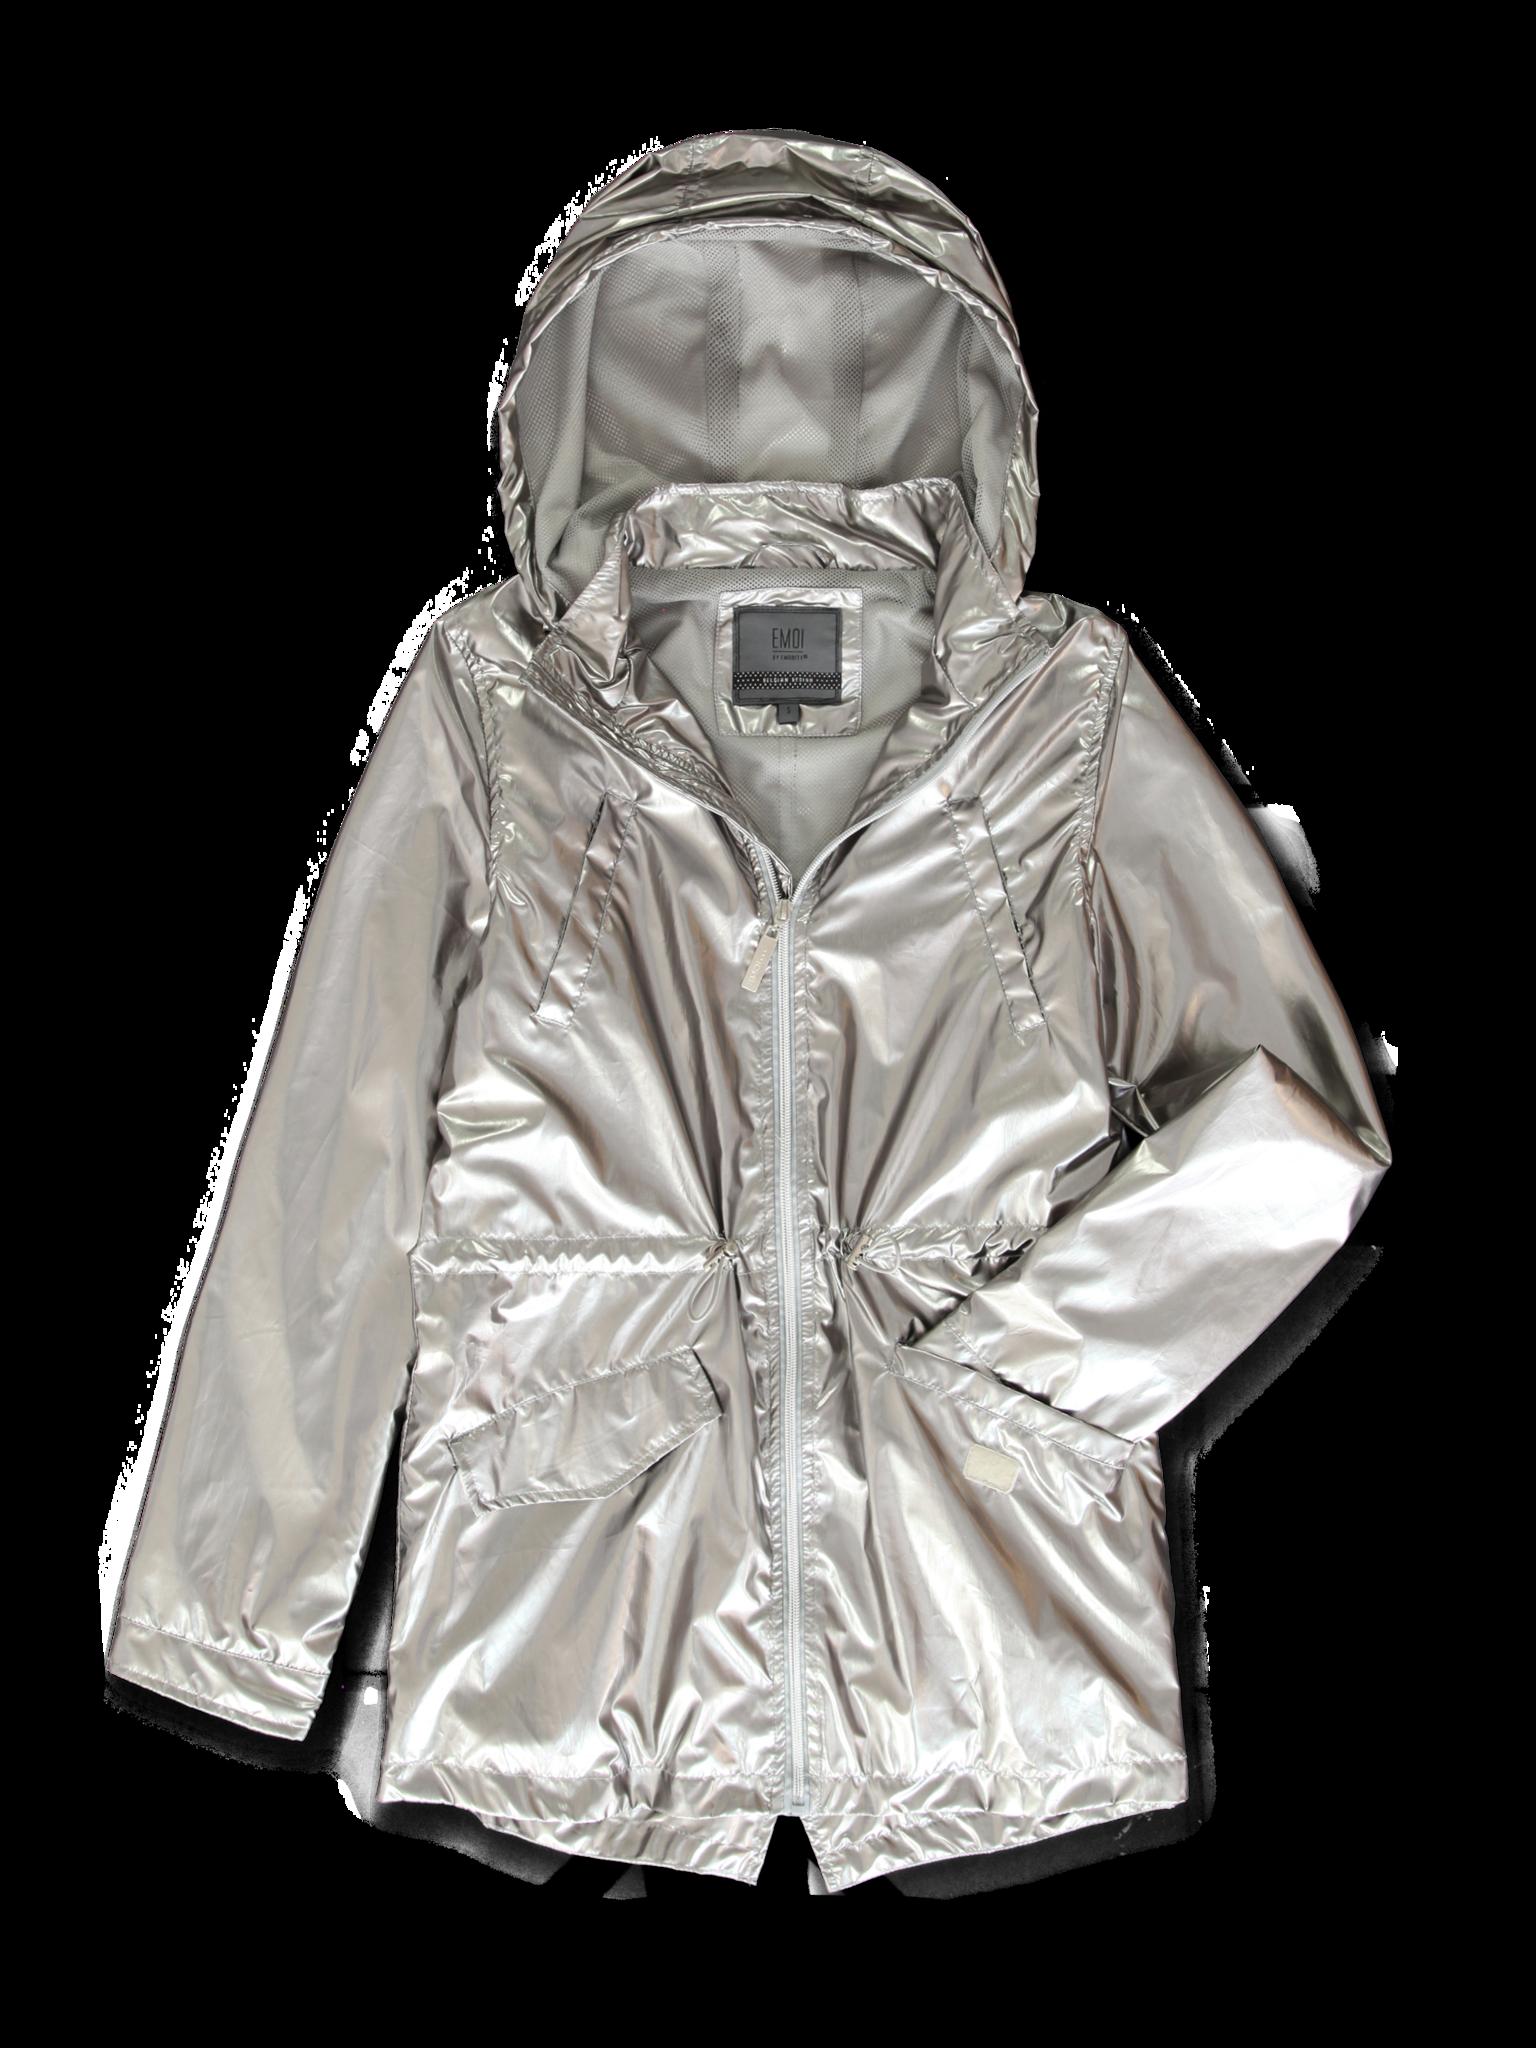 All Brands | Summerproducts Ladies | Jacket | 16 pcs/box